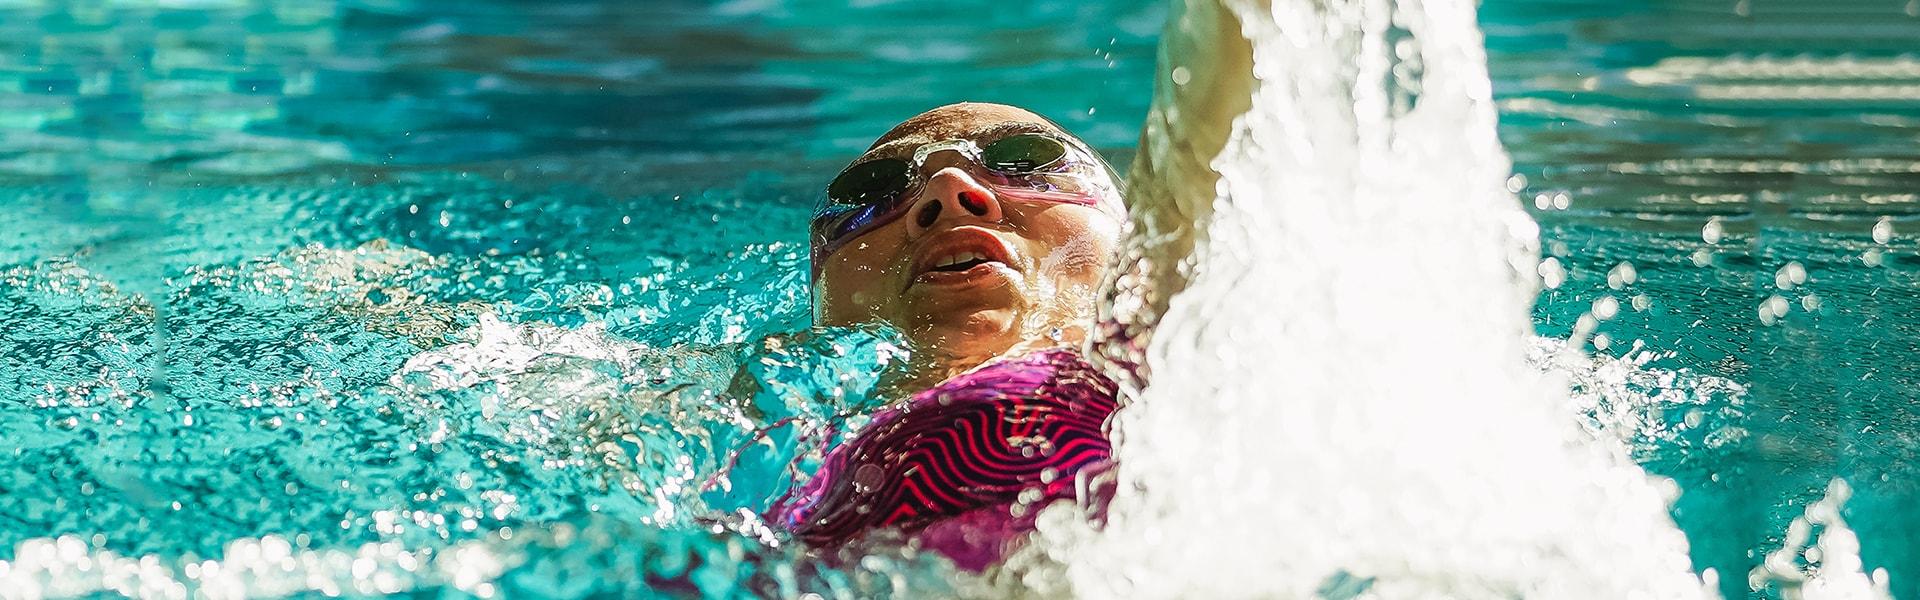 Indoor Pool Swimming Ymca Of Greater Boston